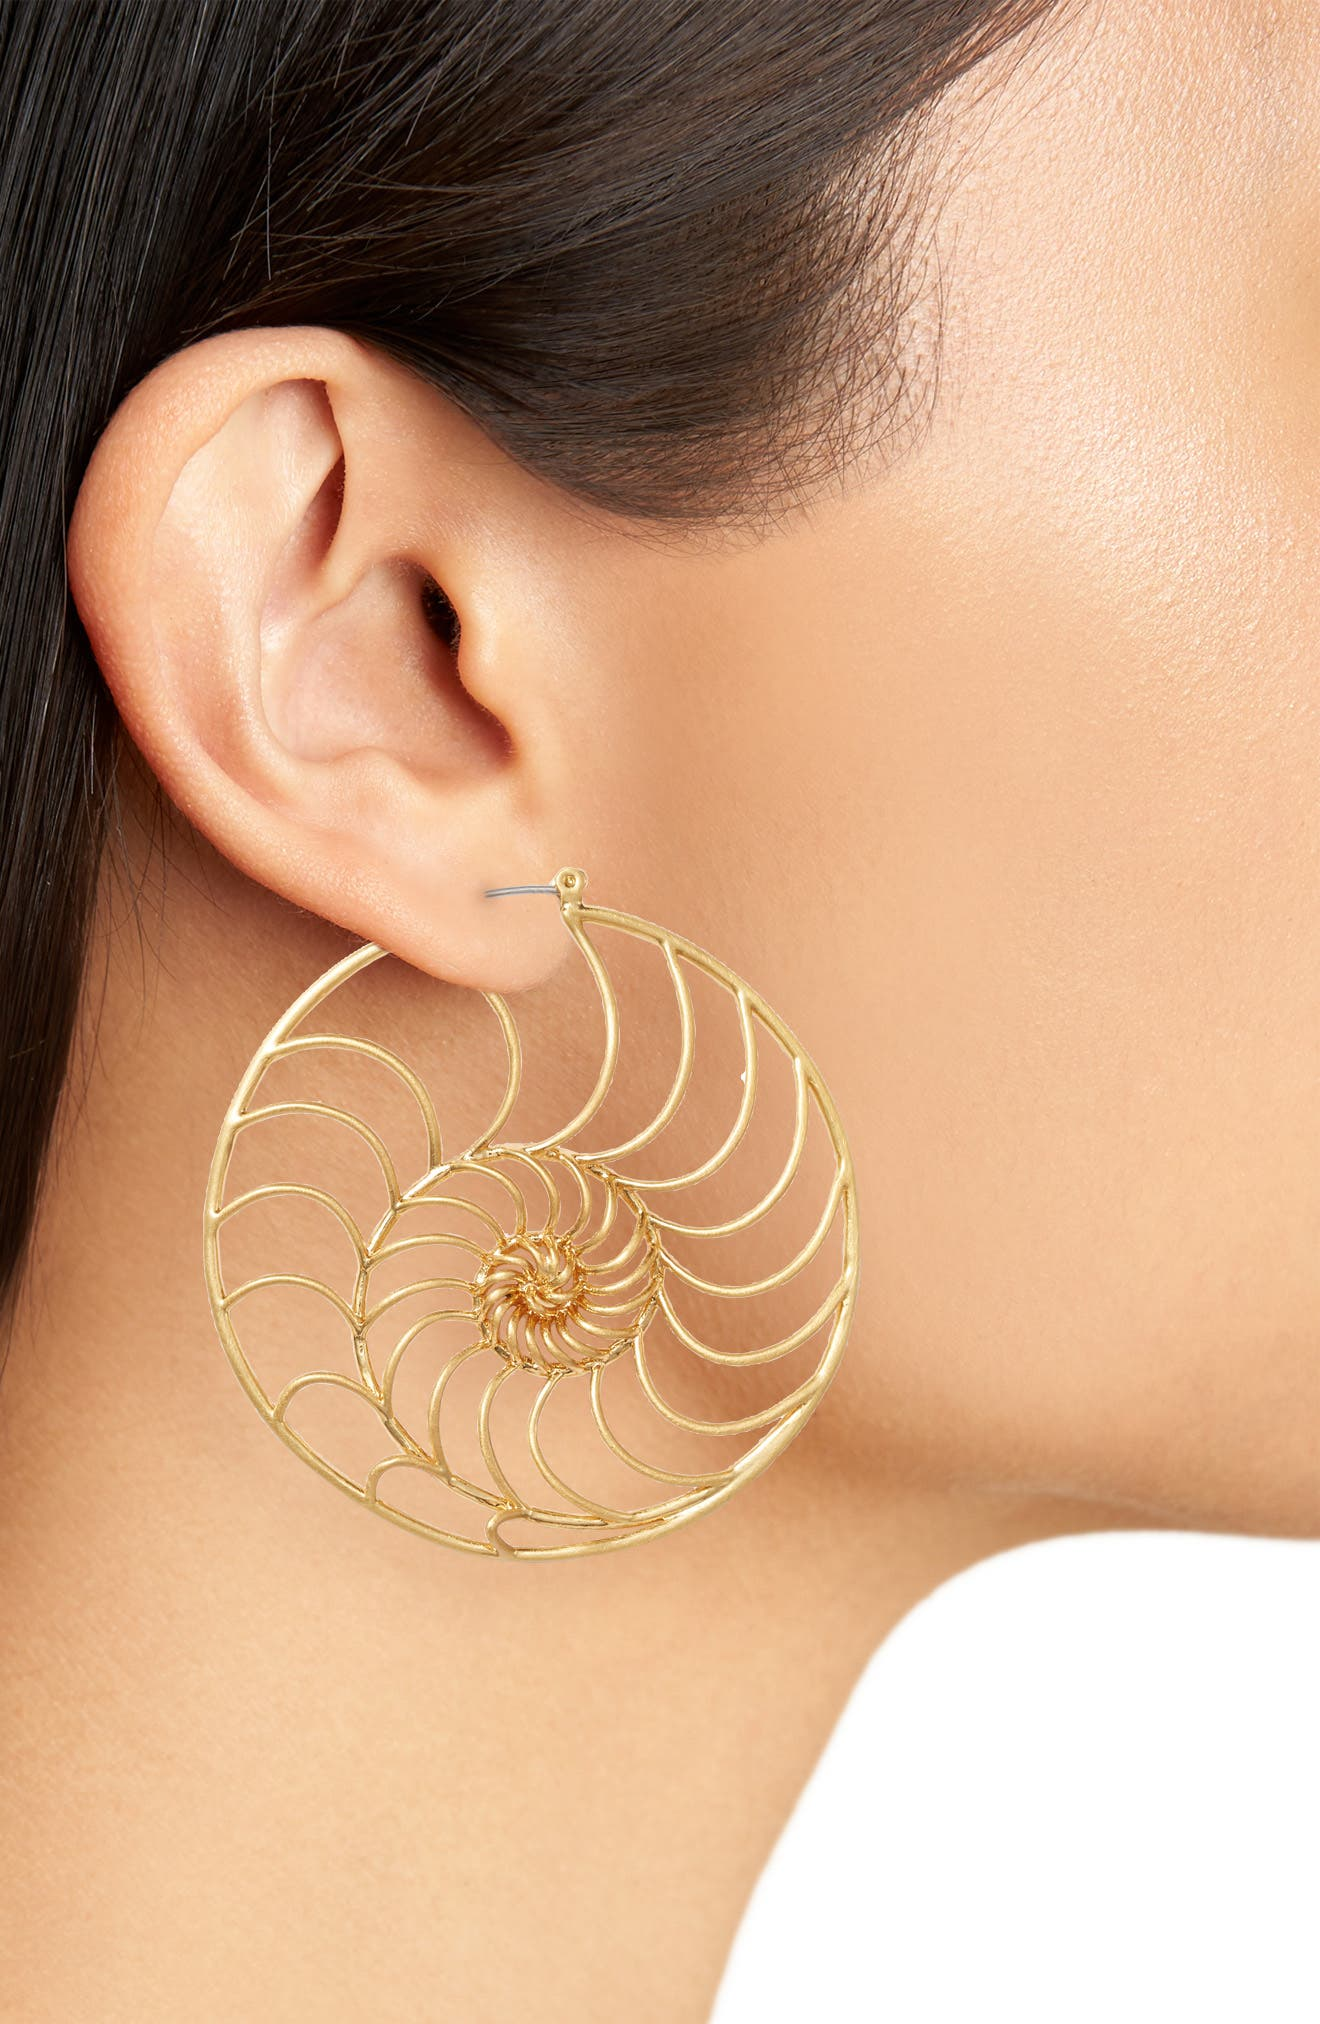 Fiddlehead Fern Earrings,                             Alternate thumbnail 2, color,                             710